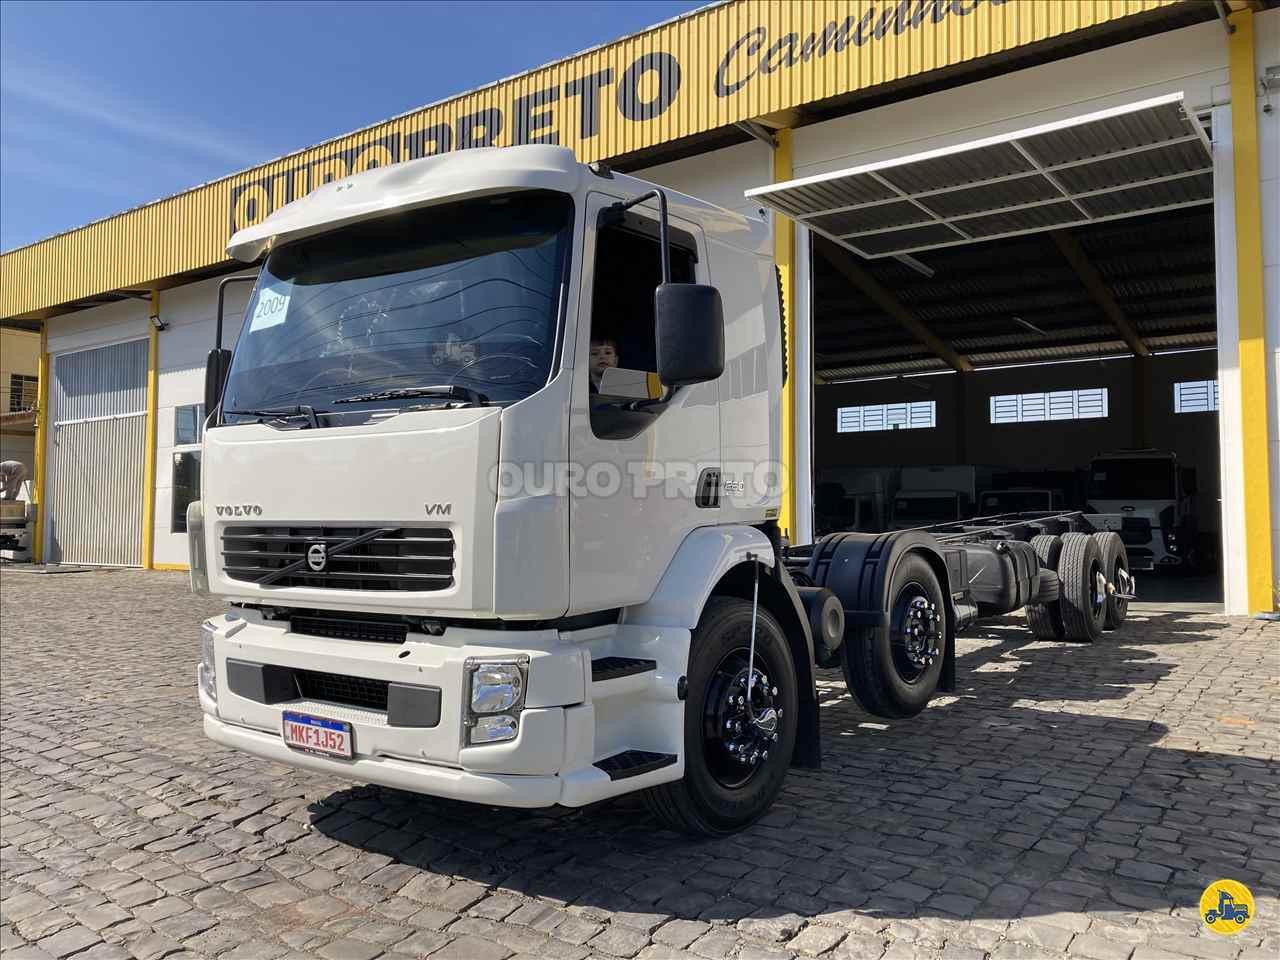 CAMINHAO VOLVO VOLVO VM 260 Chassis BiTruck 8x2 Ouro Preto Caminhões LAGES SANTA CATARINA SC